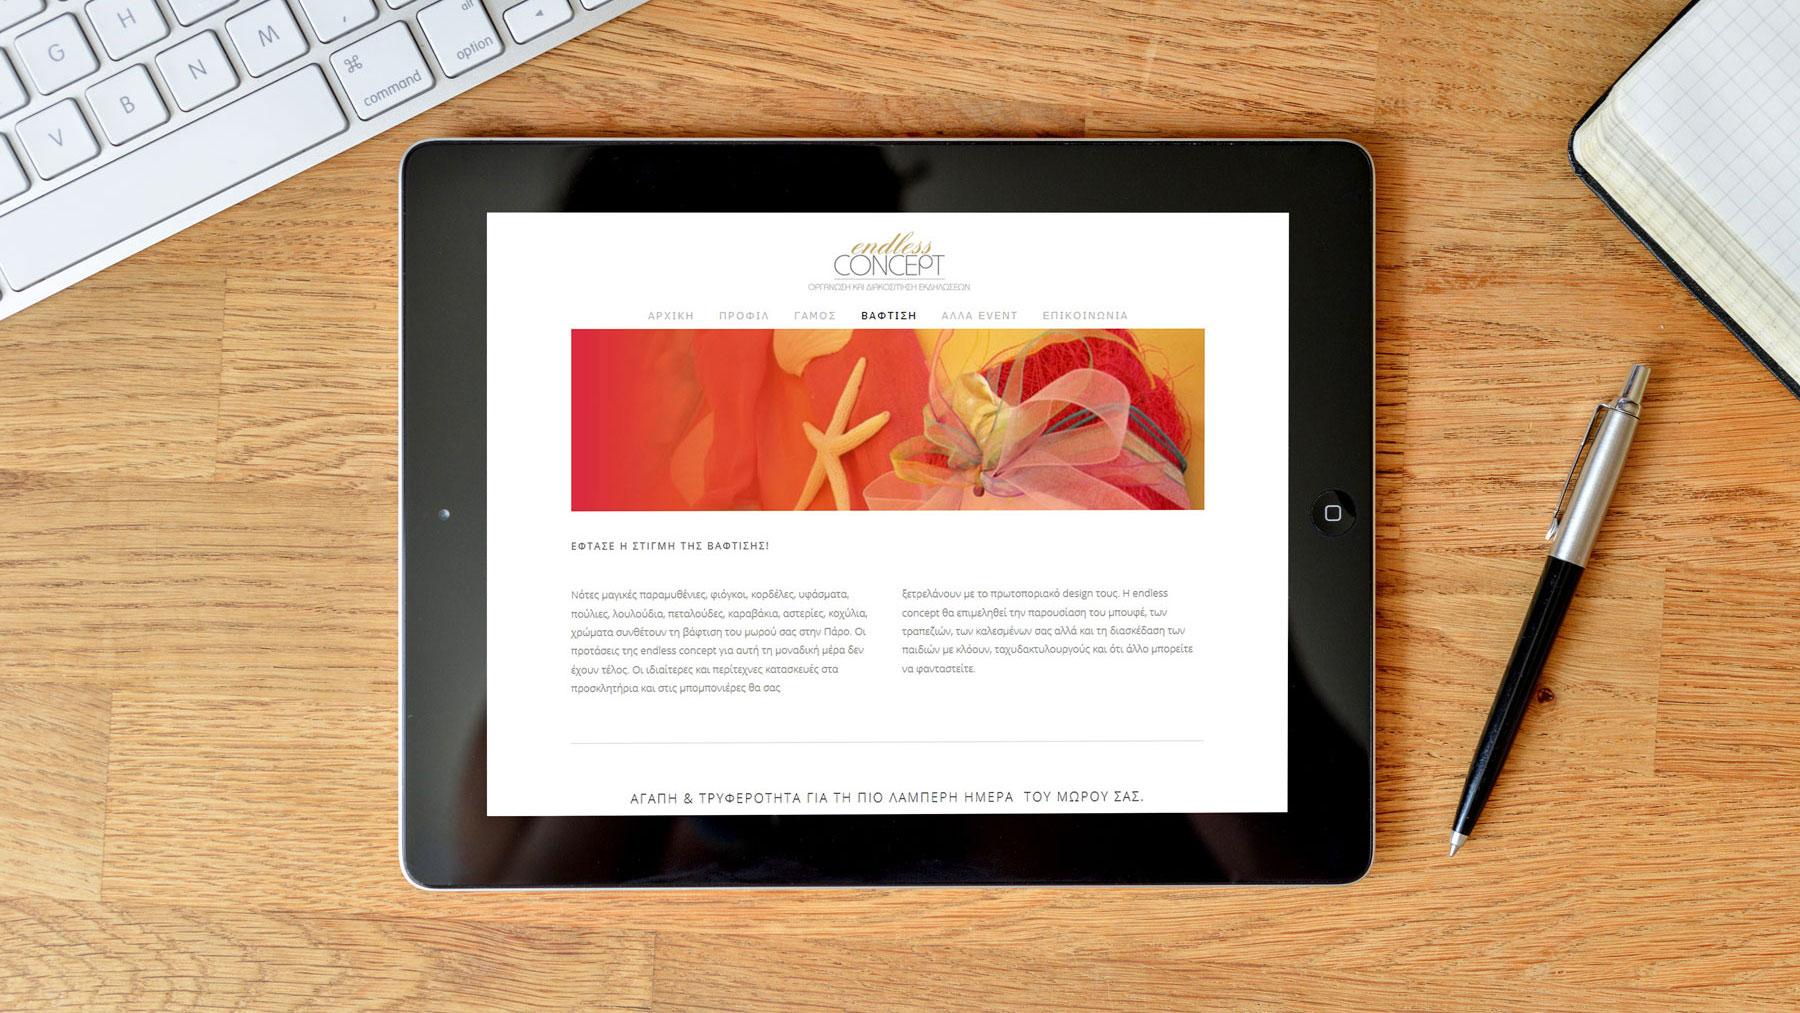 tablet-602968-qefafdb.jpg